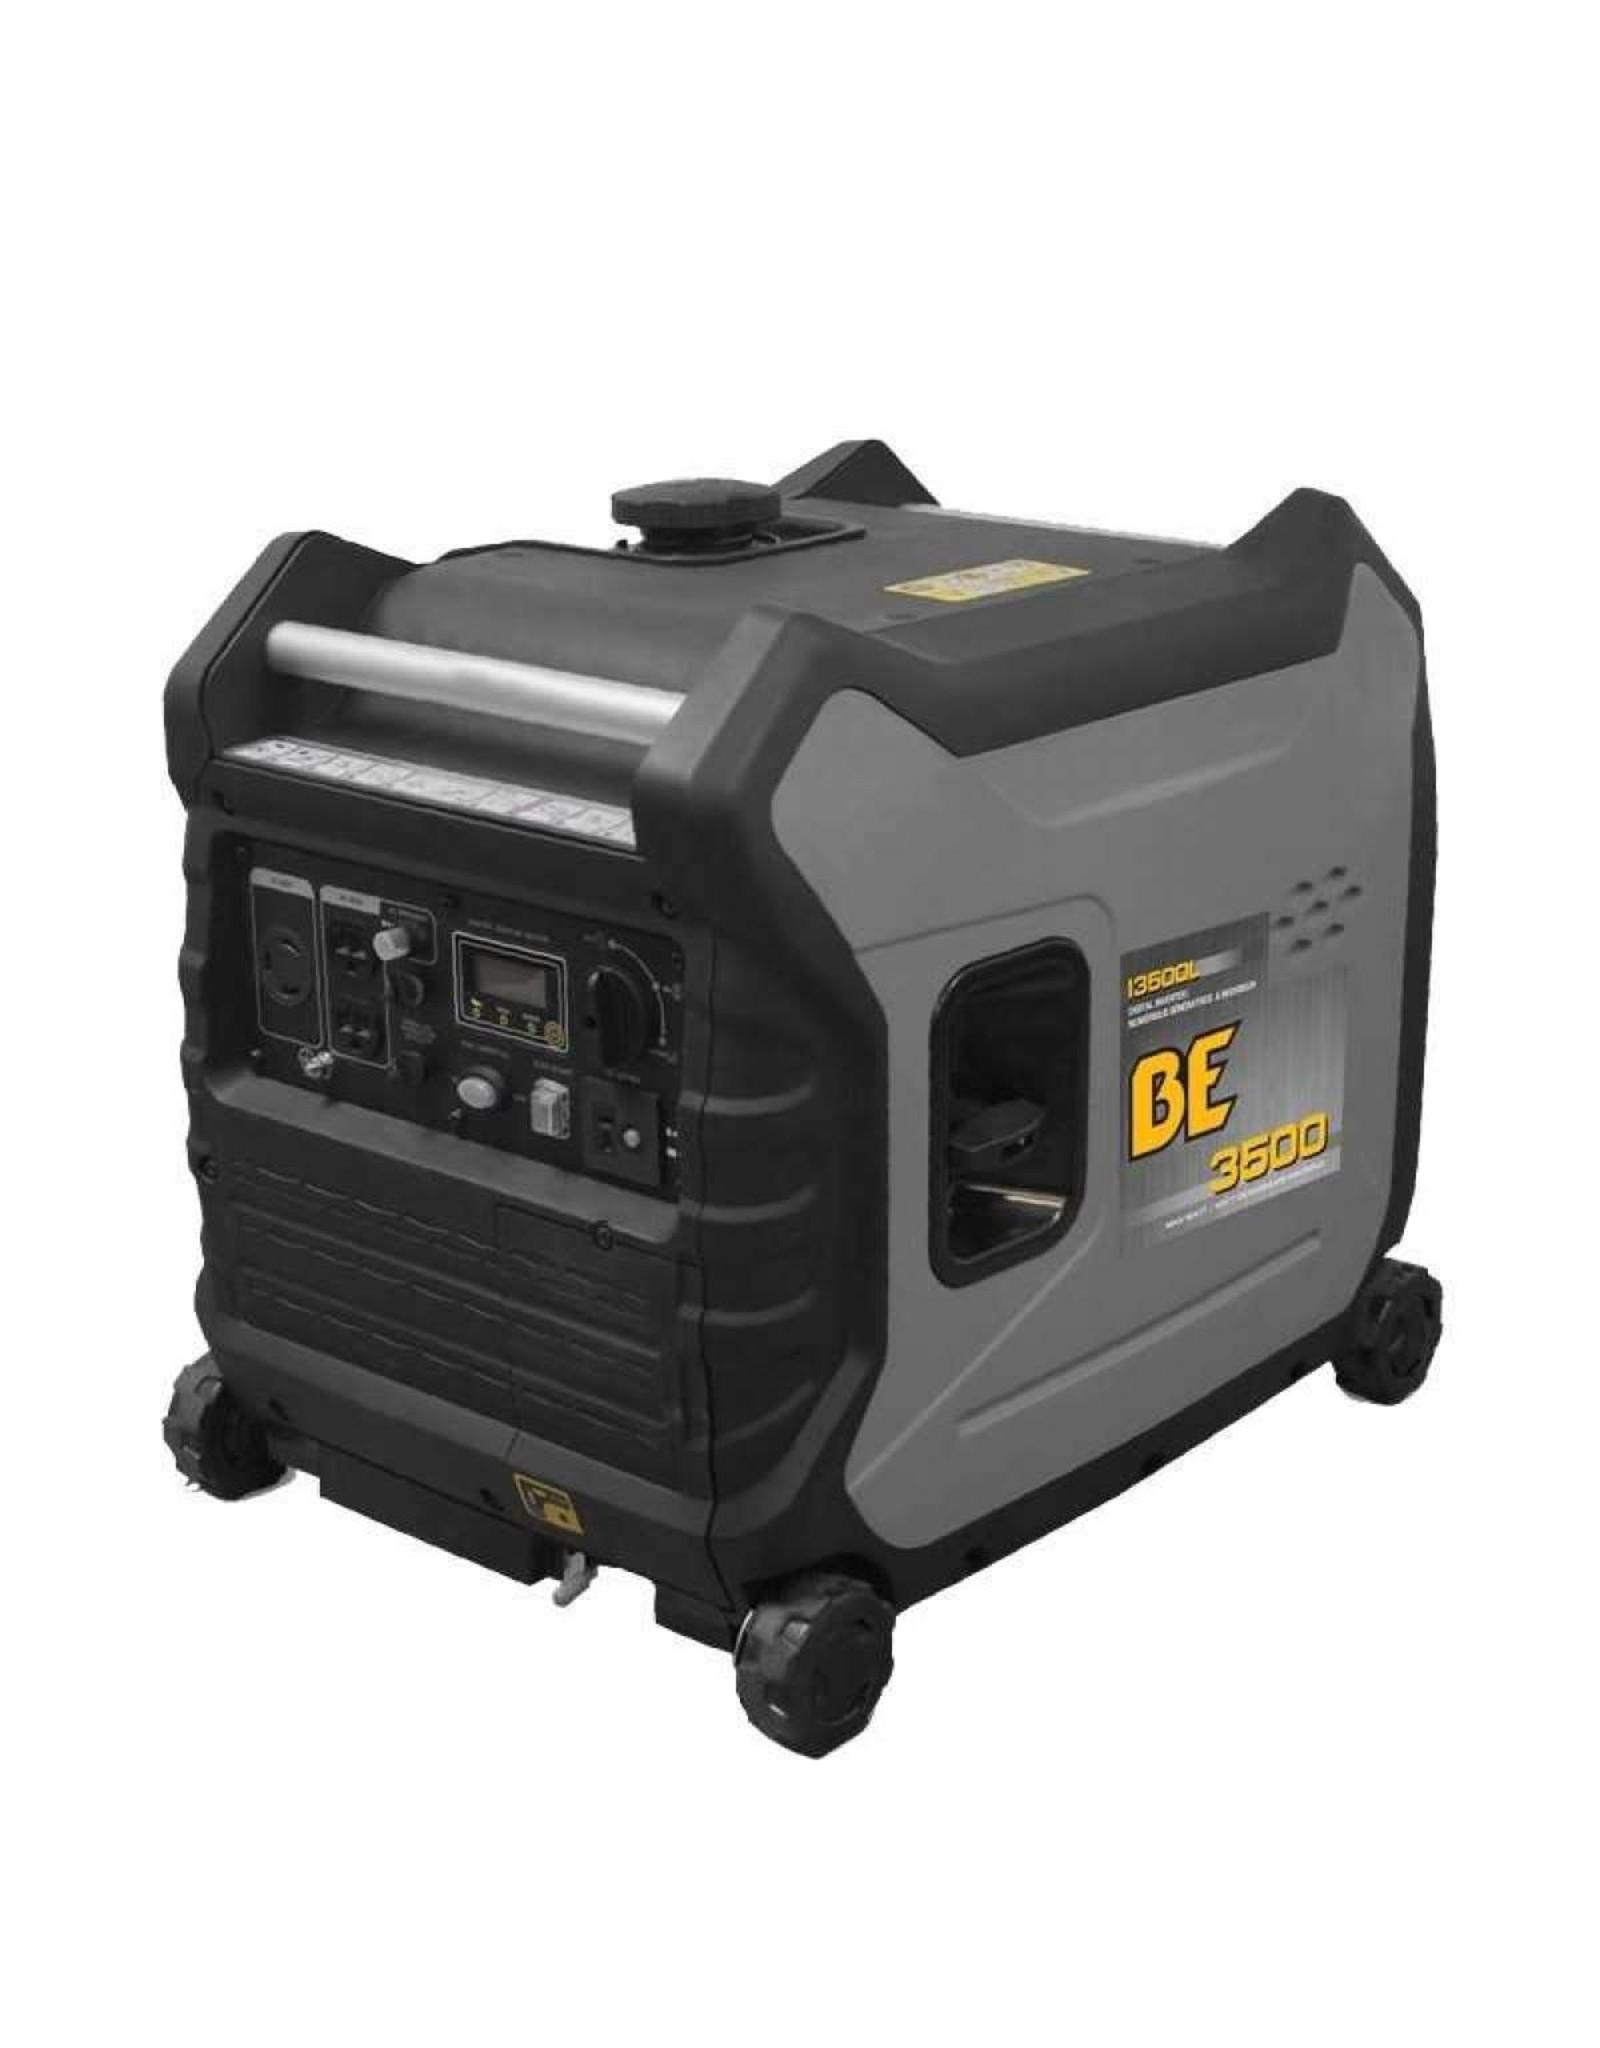 BE I3500L Inverter 3500W